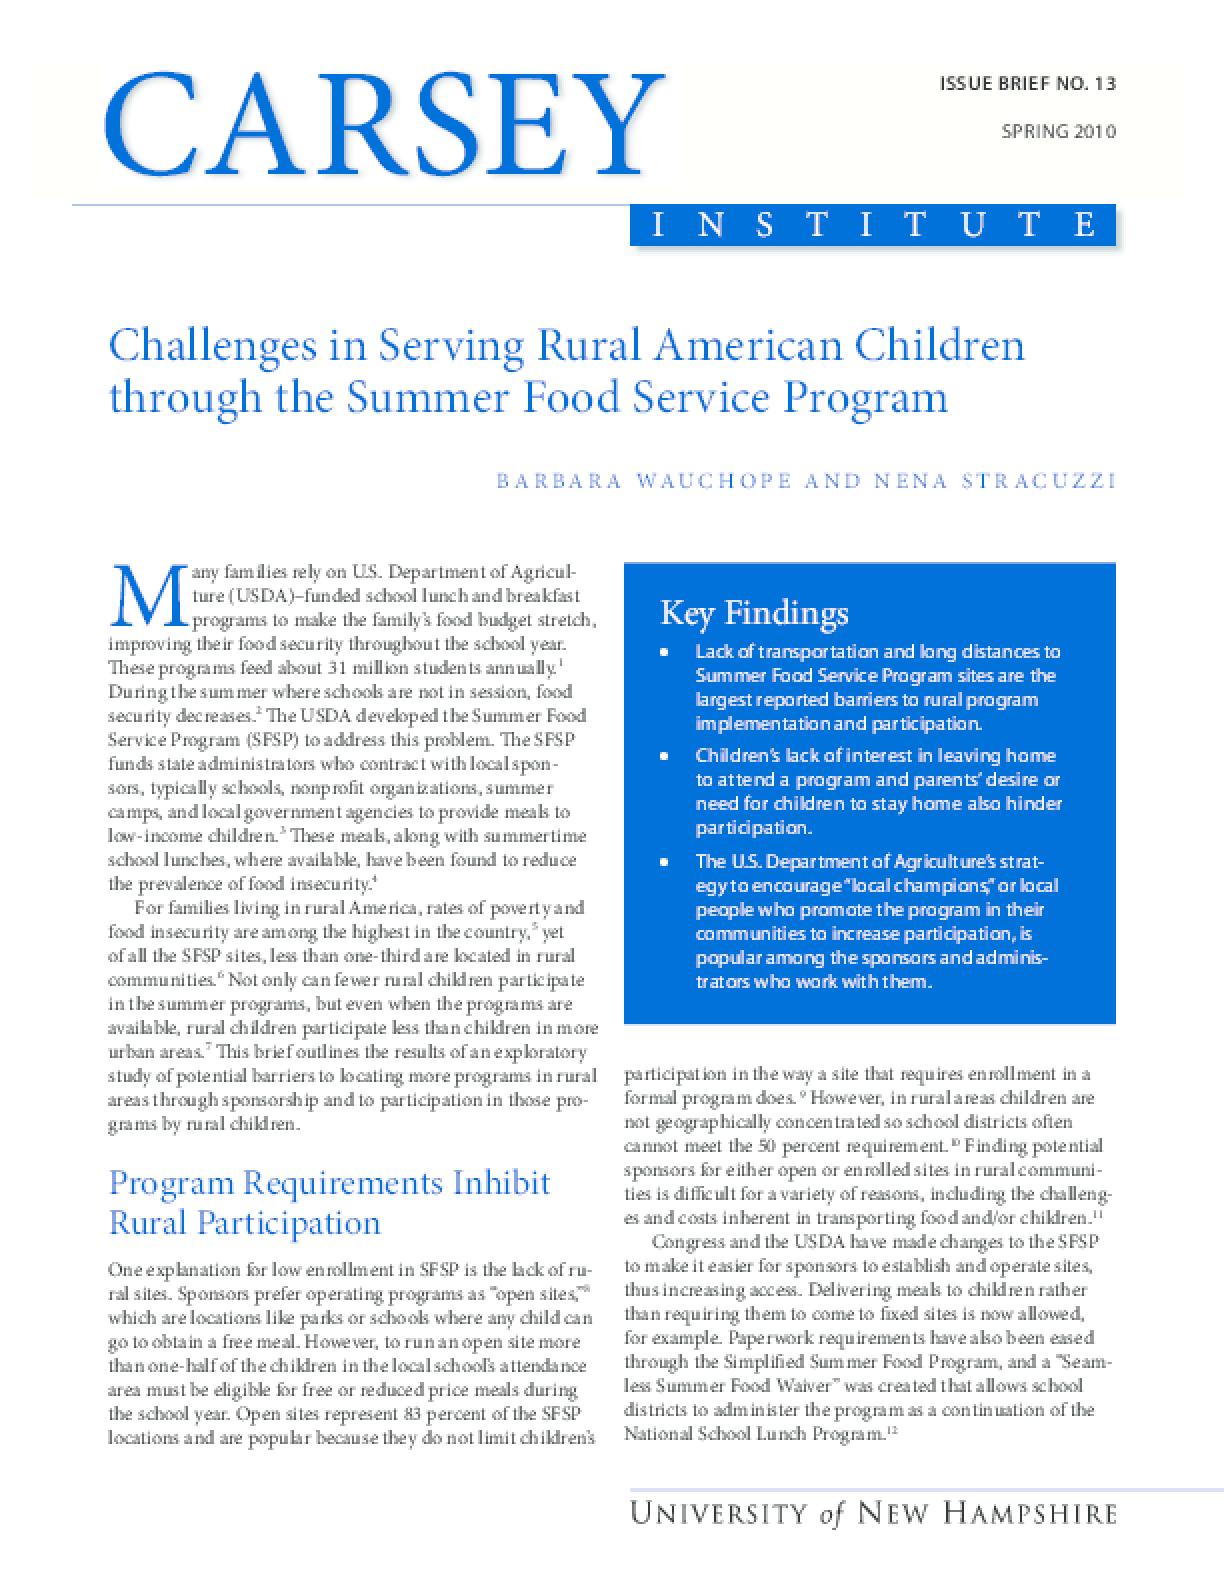 Challenges in Serving Rural American Children Through the Summer Food Service Program